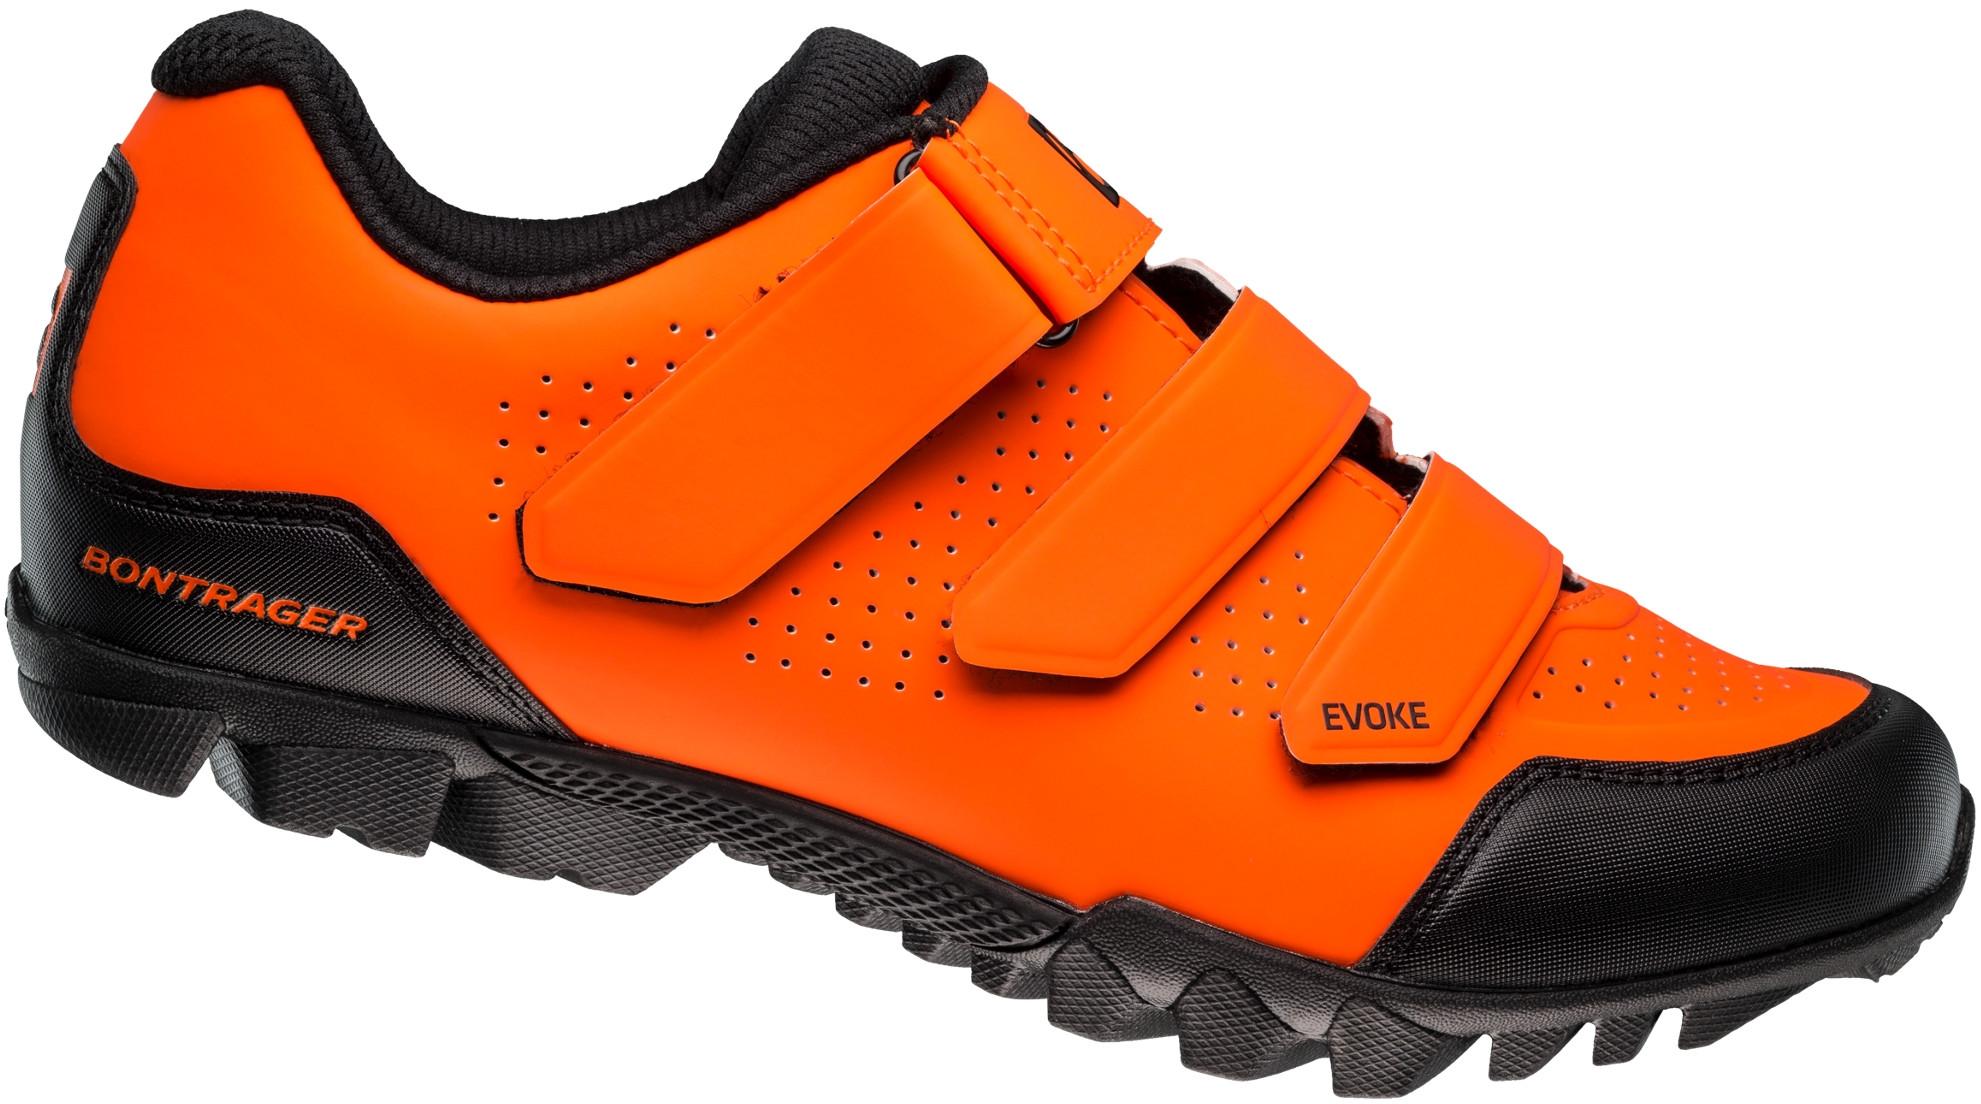 Bontrager Mtb Shoes For Sale